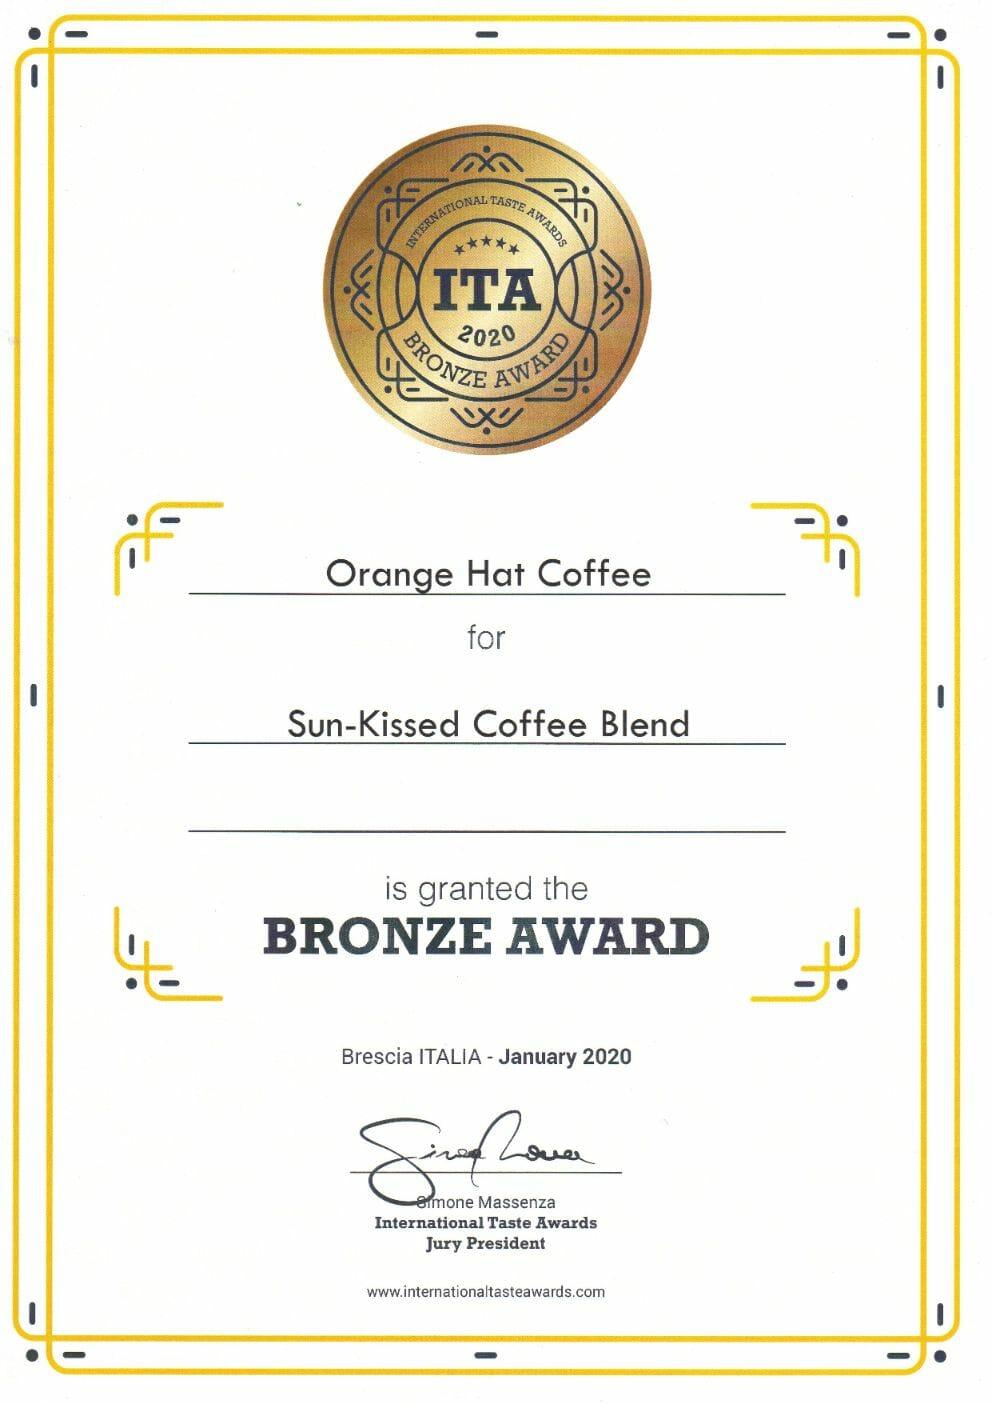 Orange Hat Coffee - International Taste Awards 2020 abalvošanas pasākumā! 10